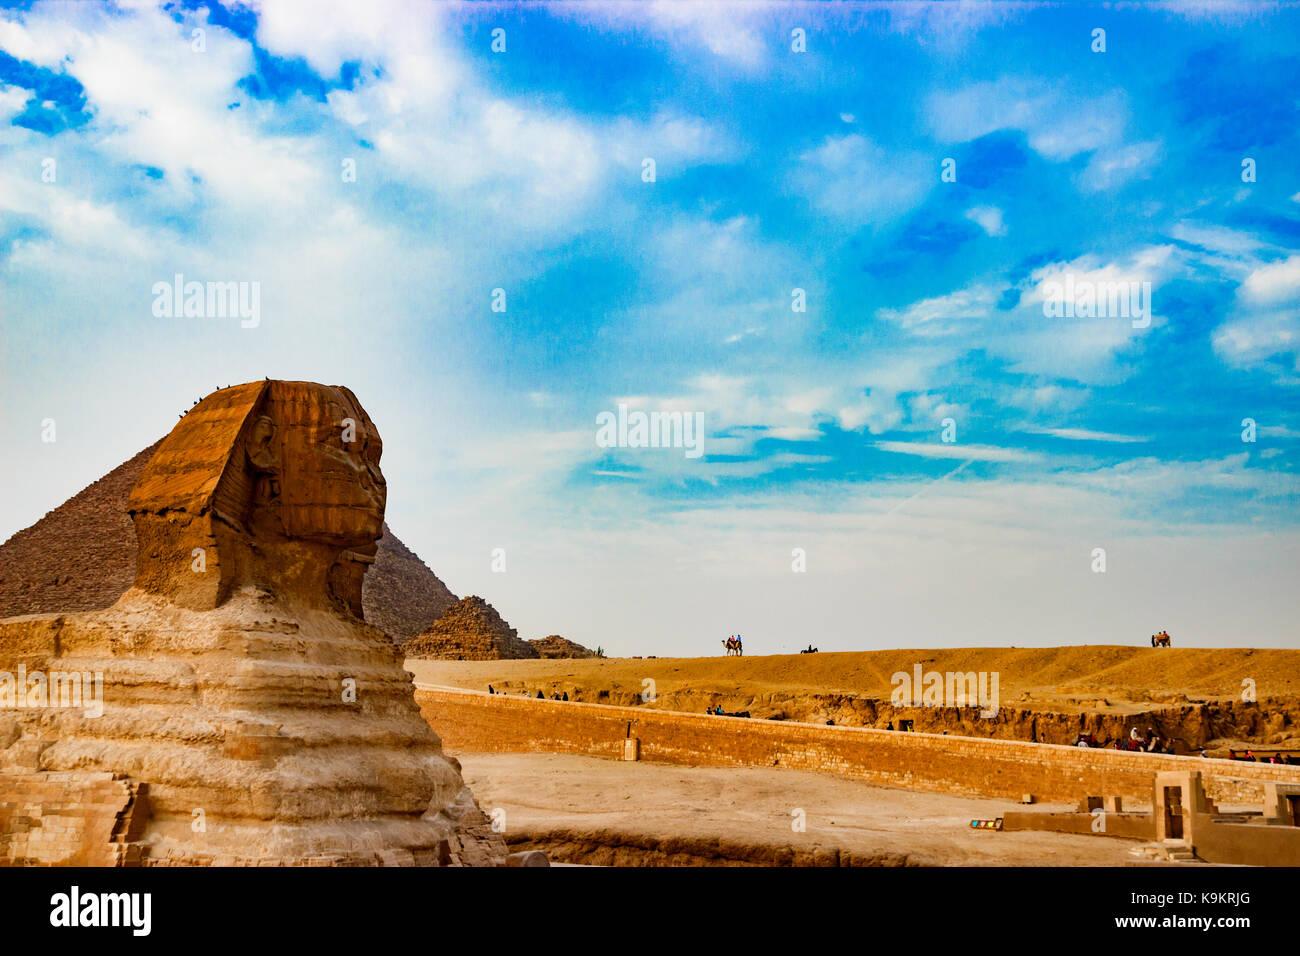 La esfinge en El Cairo, Egipto Imagen De Stock